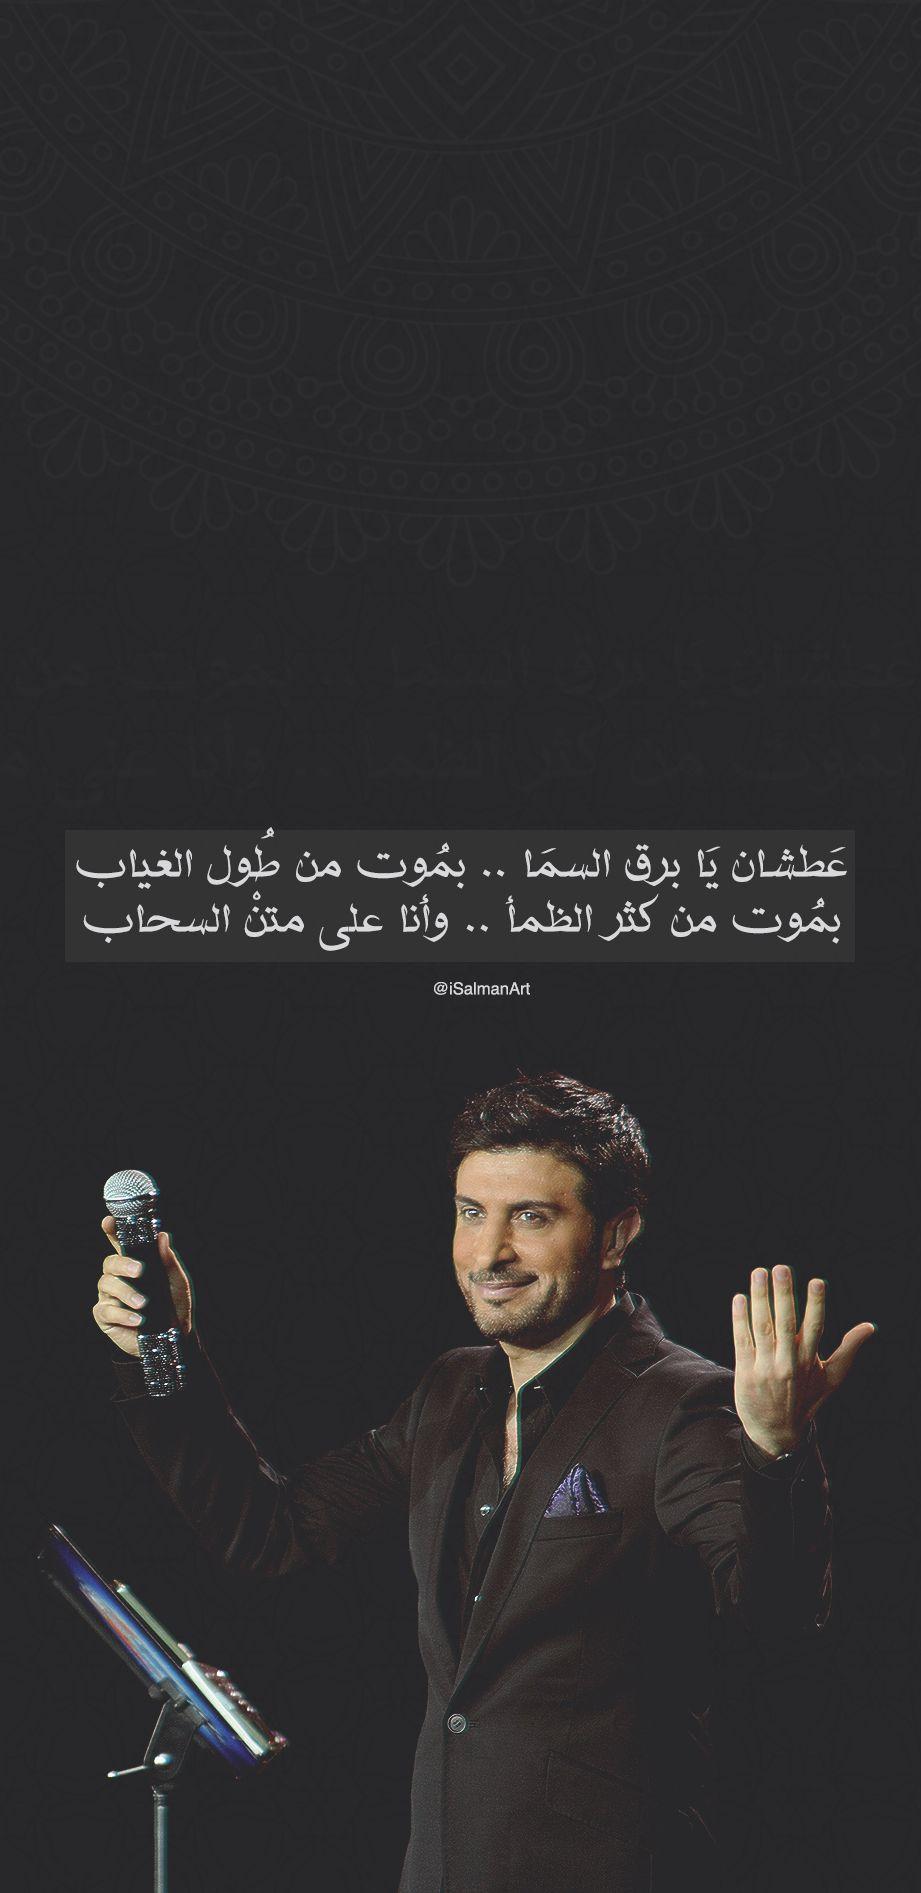 ماجد المهندس ع طشان ي ا برق السم ا Beautiful Arabic Words Cover Photo Quotes Iphone Wallpaper Quotes Love